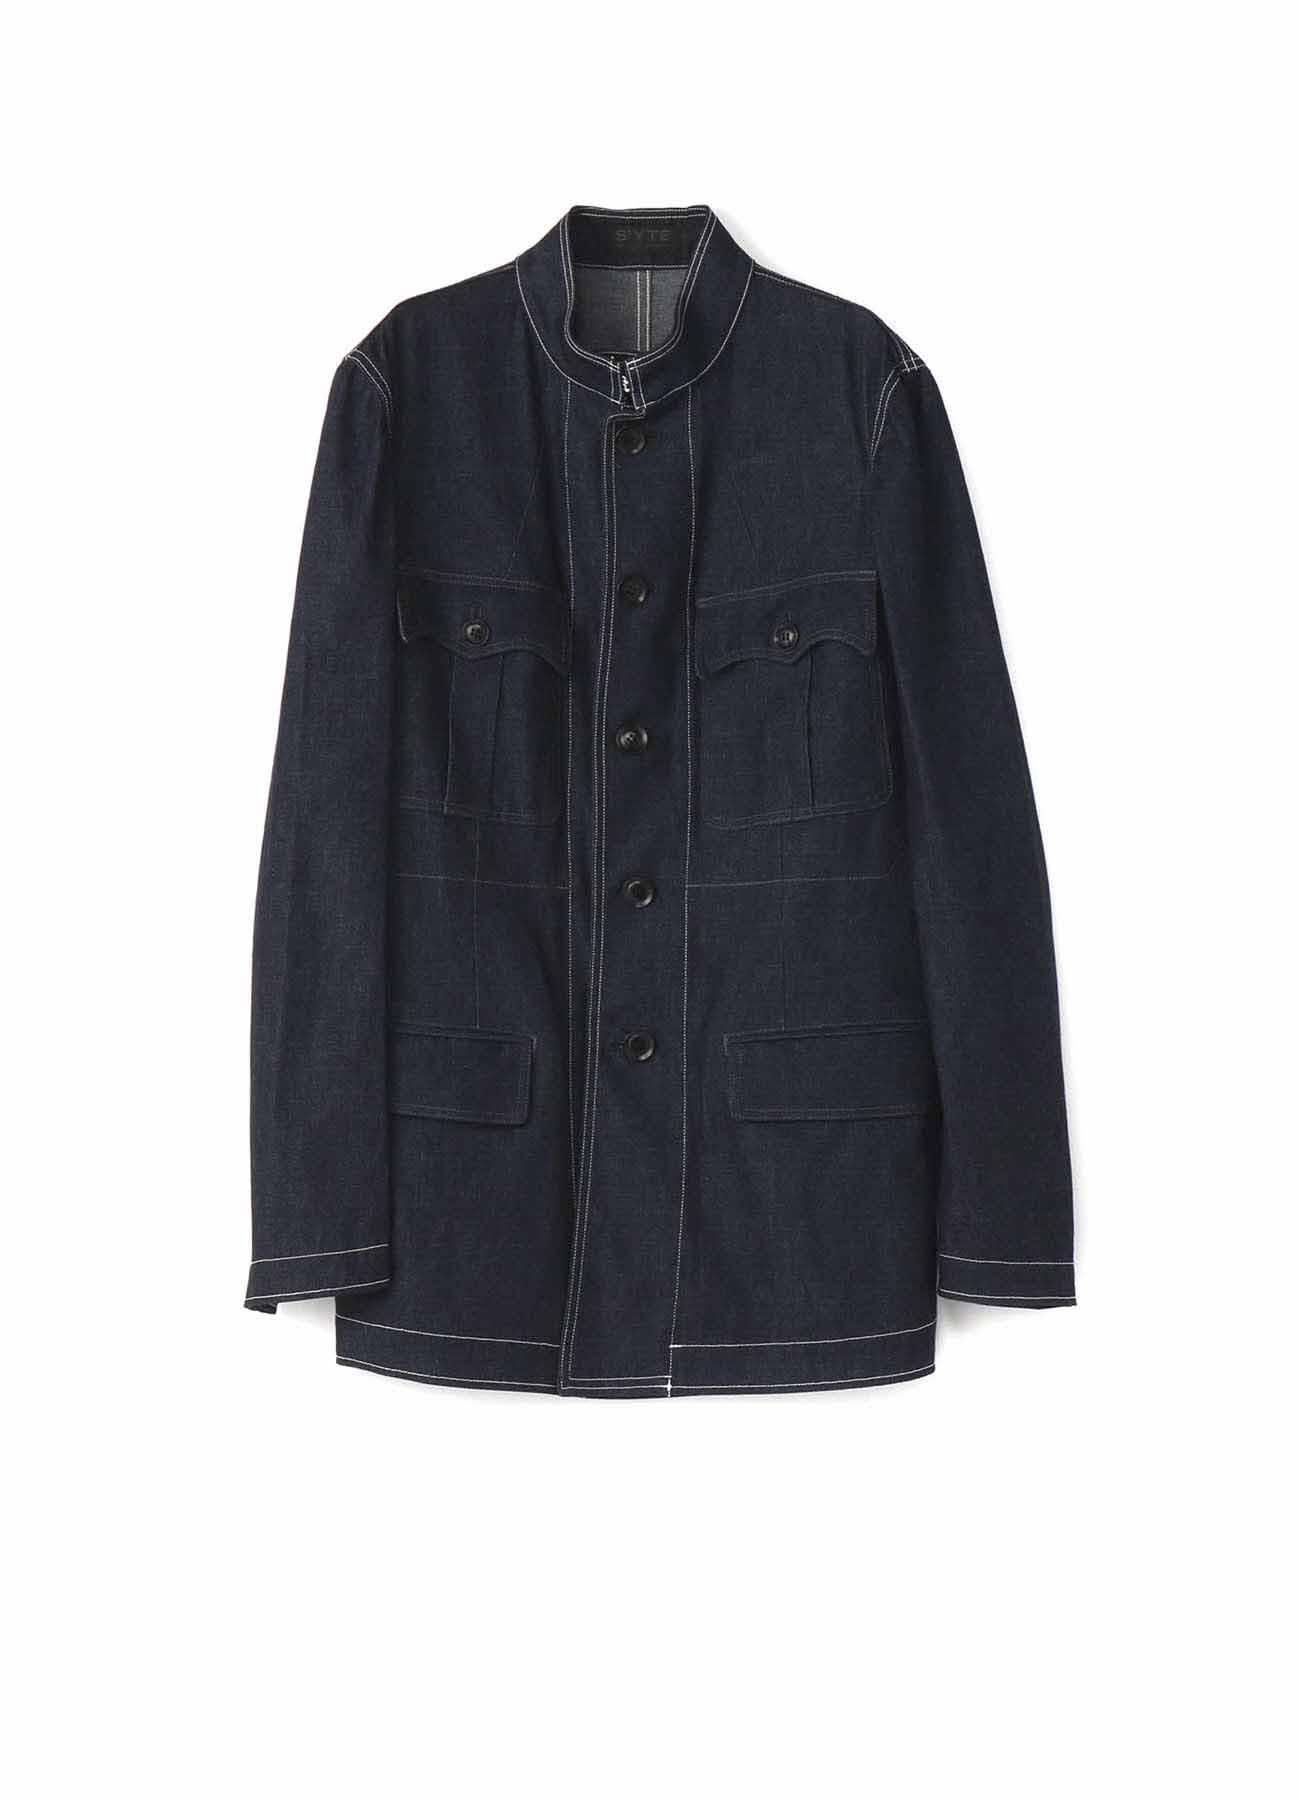 8oz Denim Military Jacket